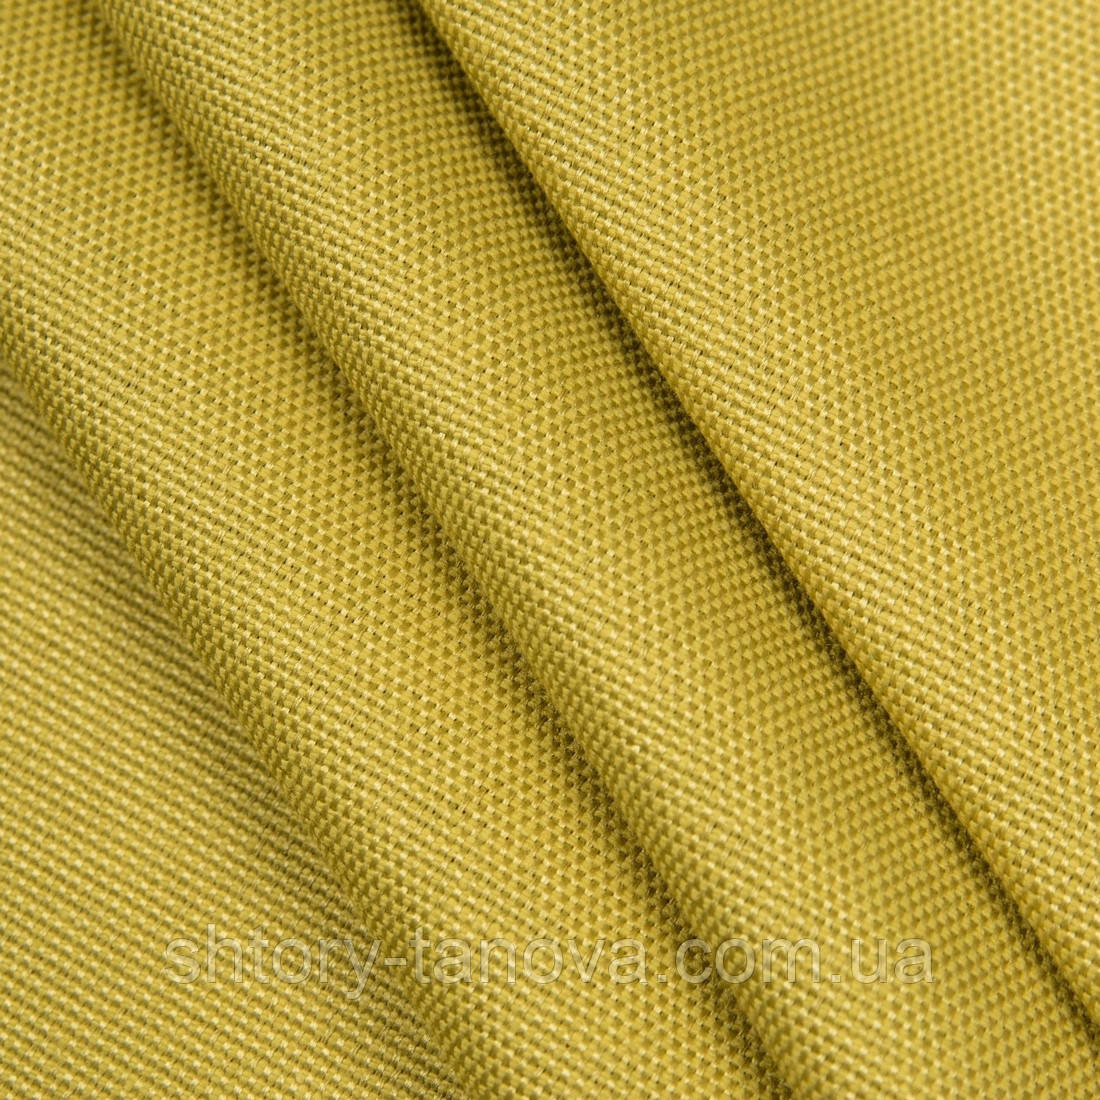 Декоративна тканина панама піско